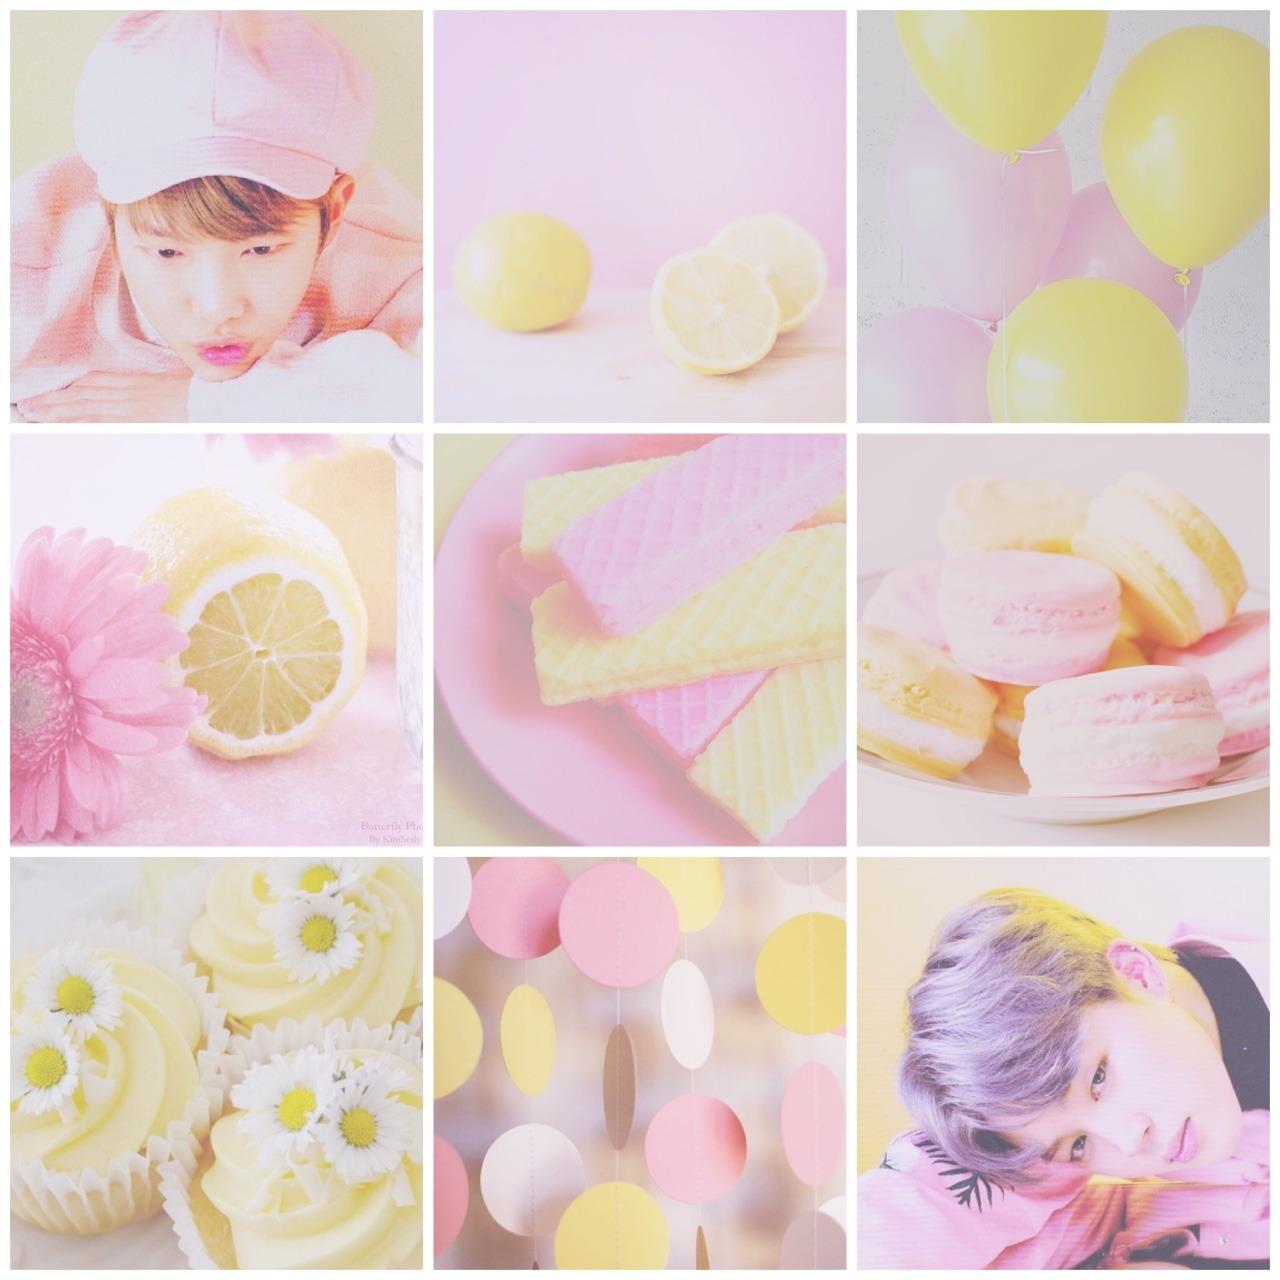 BTS Moodboards  Pink and yellow pastel minjoonnammin